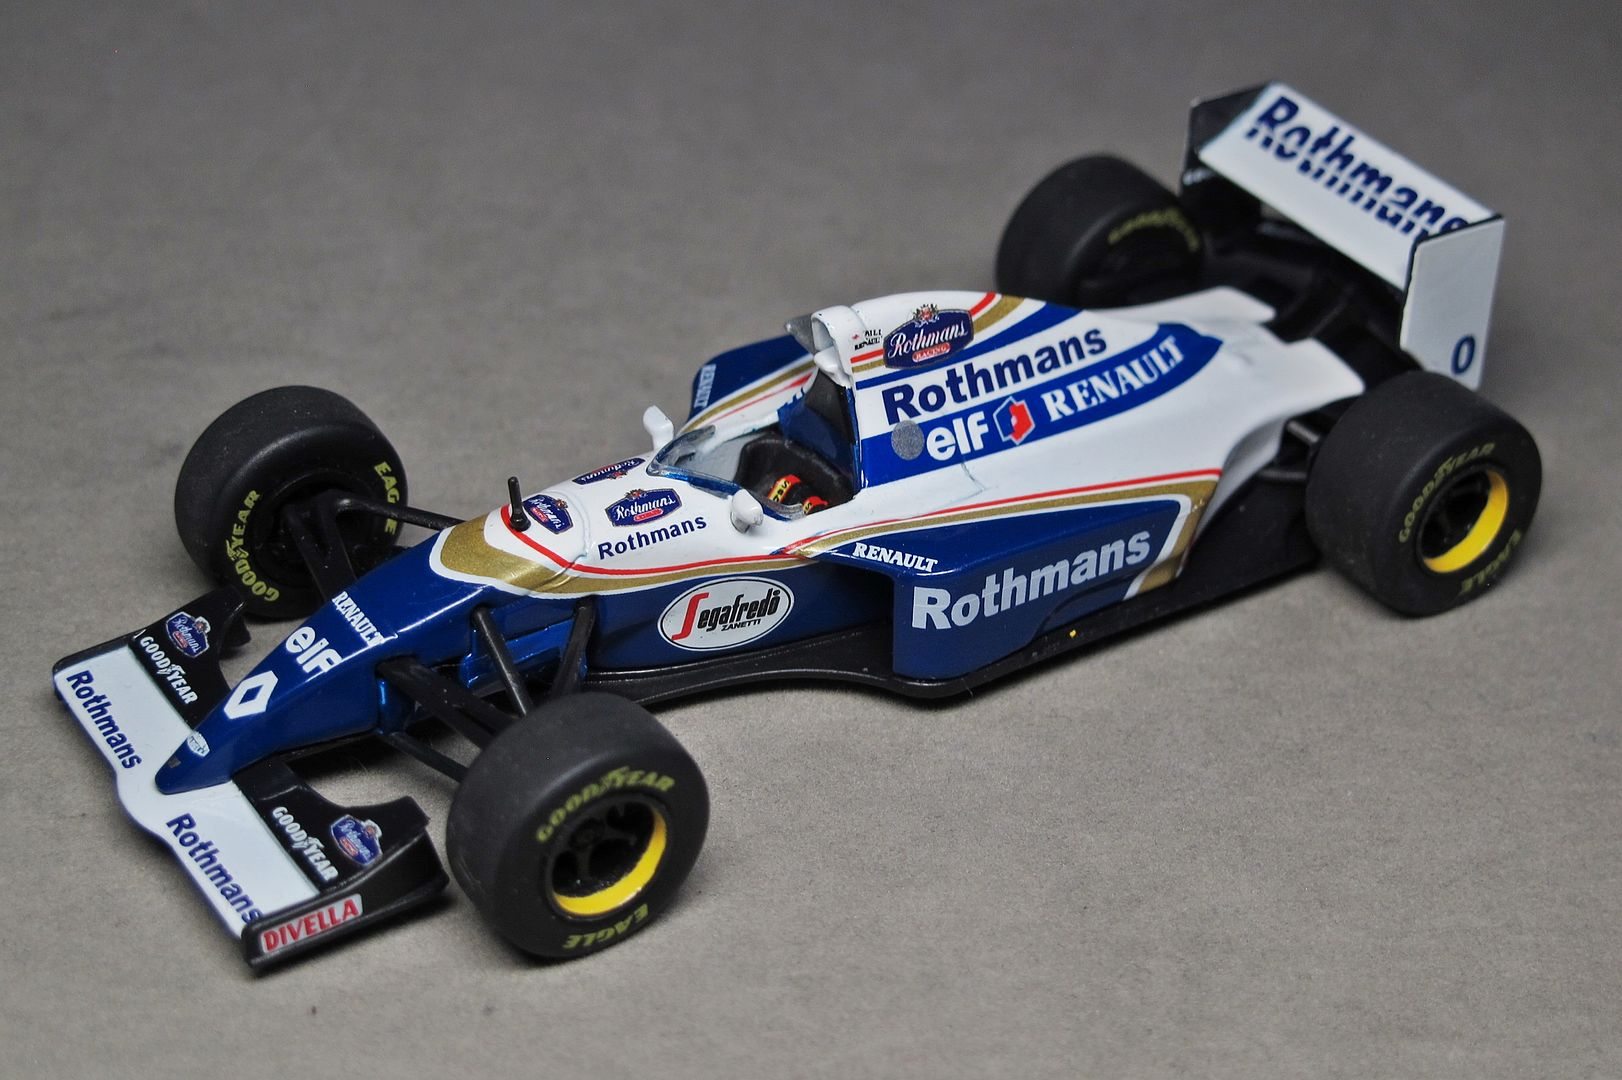 Formula 1 №22 - Williams FW16 - Дэймон Хилл (1994)